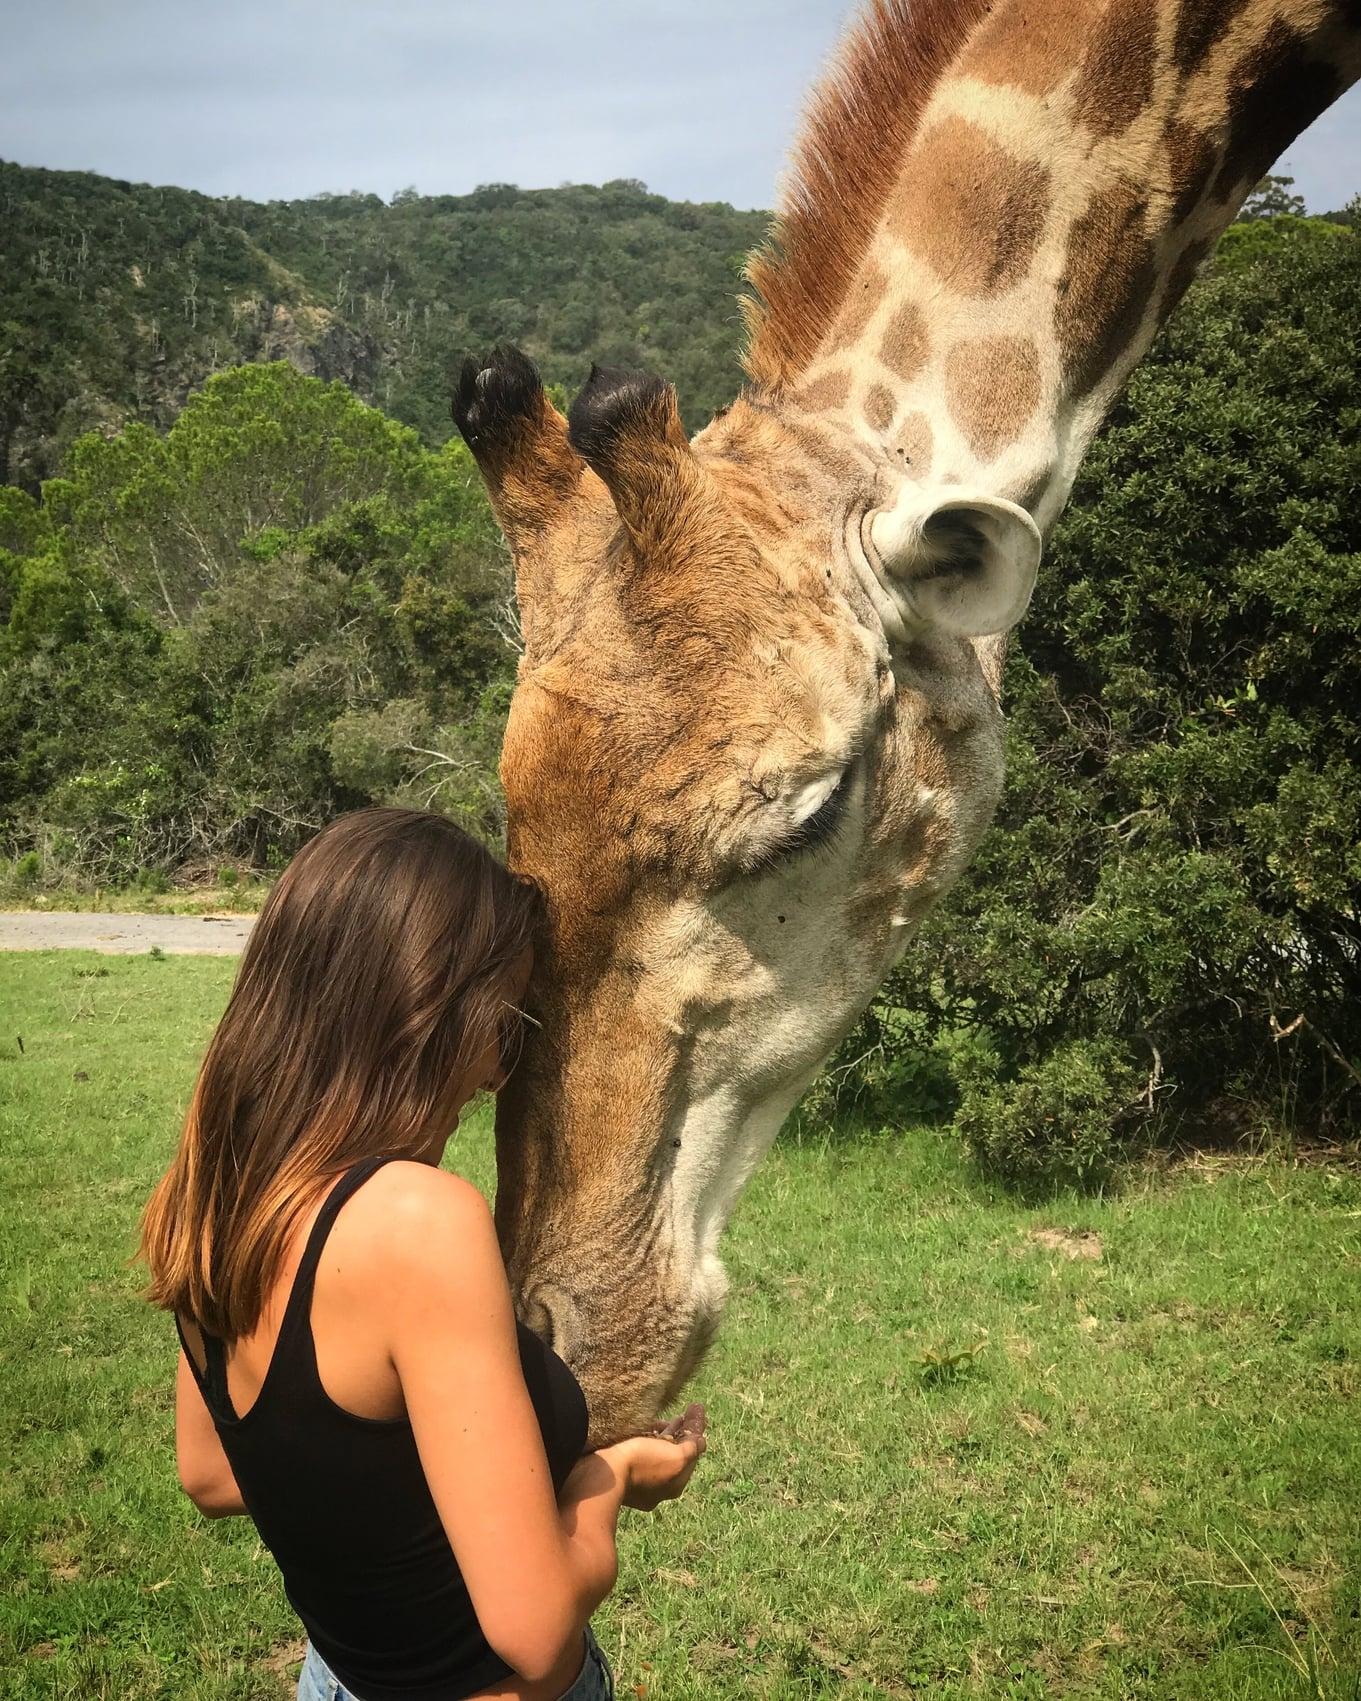 Travel the world as a veterinary nurse